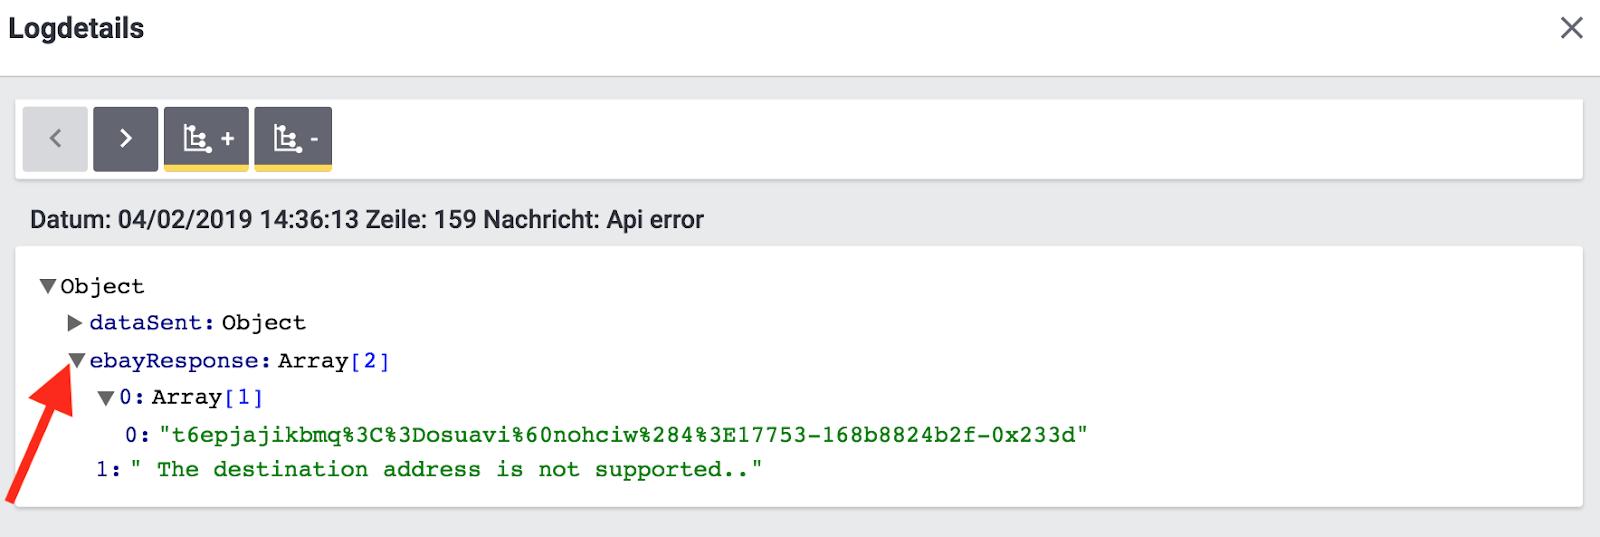 eBay Fulfillment log entry